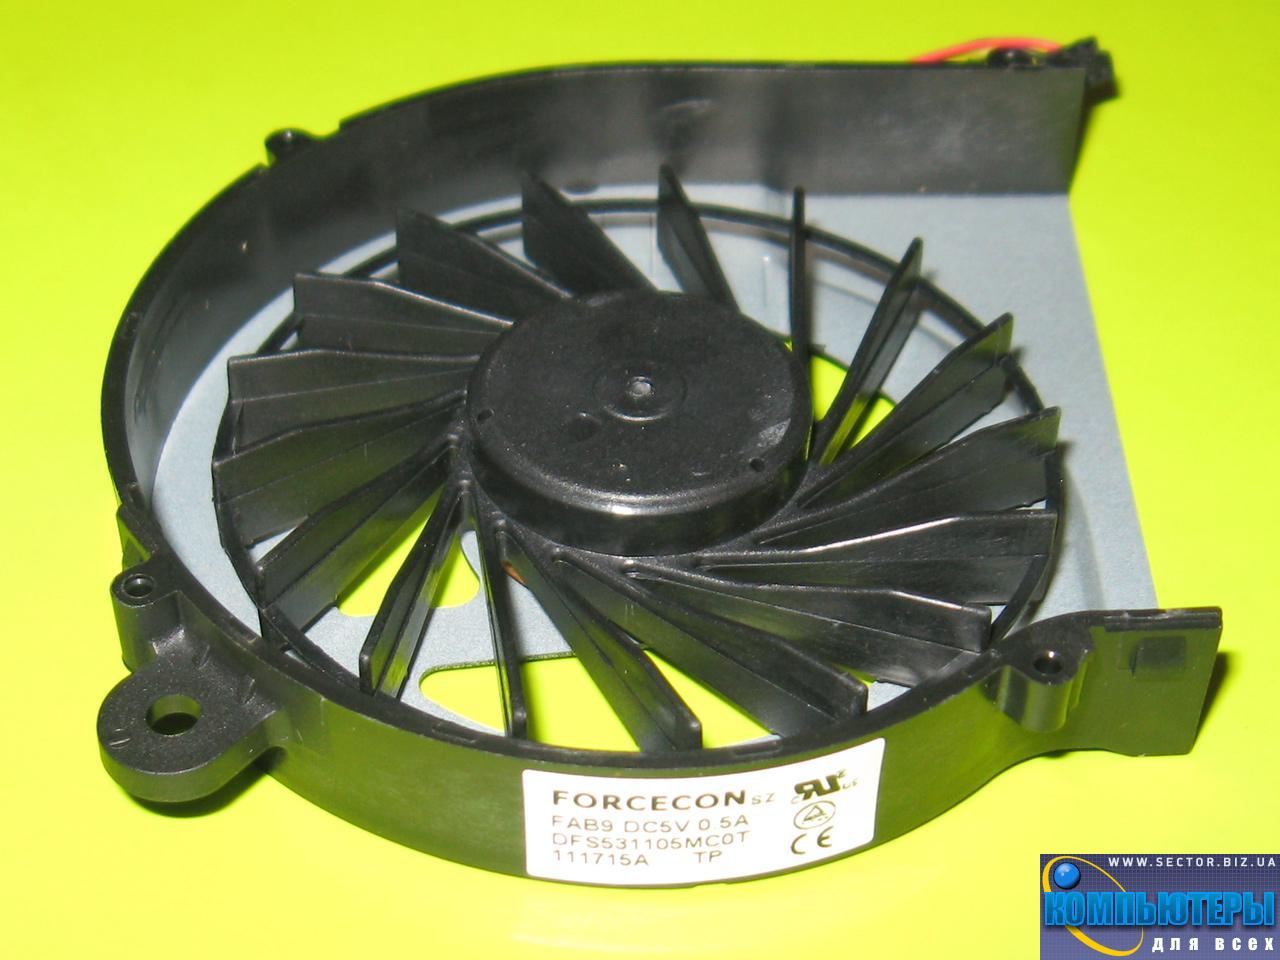 Кулер к ноутбуку HP Compaq CQ42 G42 G4 G6 G7 CQ56 G56 p/n: DFS531105MC0T FAB9. Фото № 2.